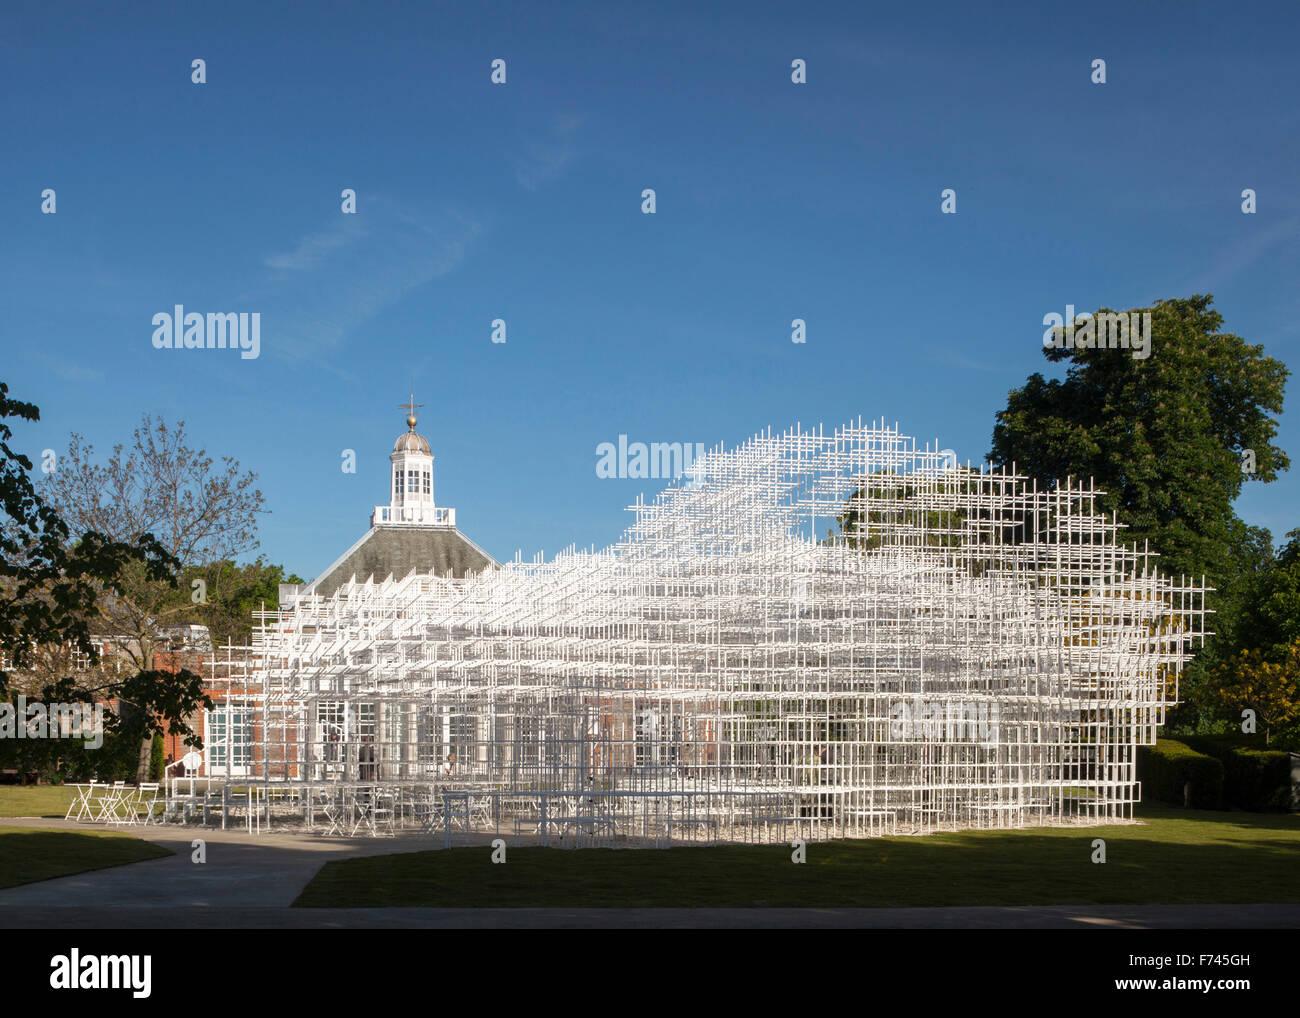 Serpentine Pavillion facade, 2013 by Sou Fujimoto and Aecom engineers, Kensington Gardens London, UK - Stock Image